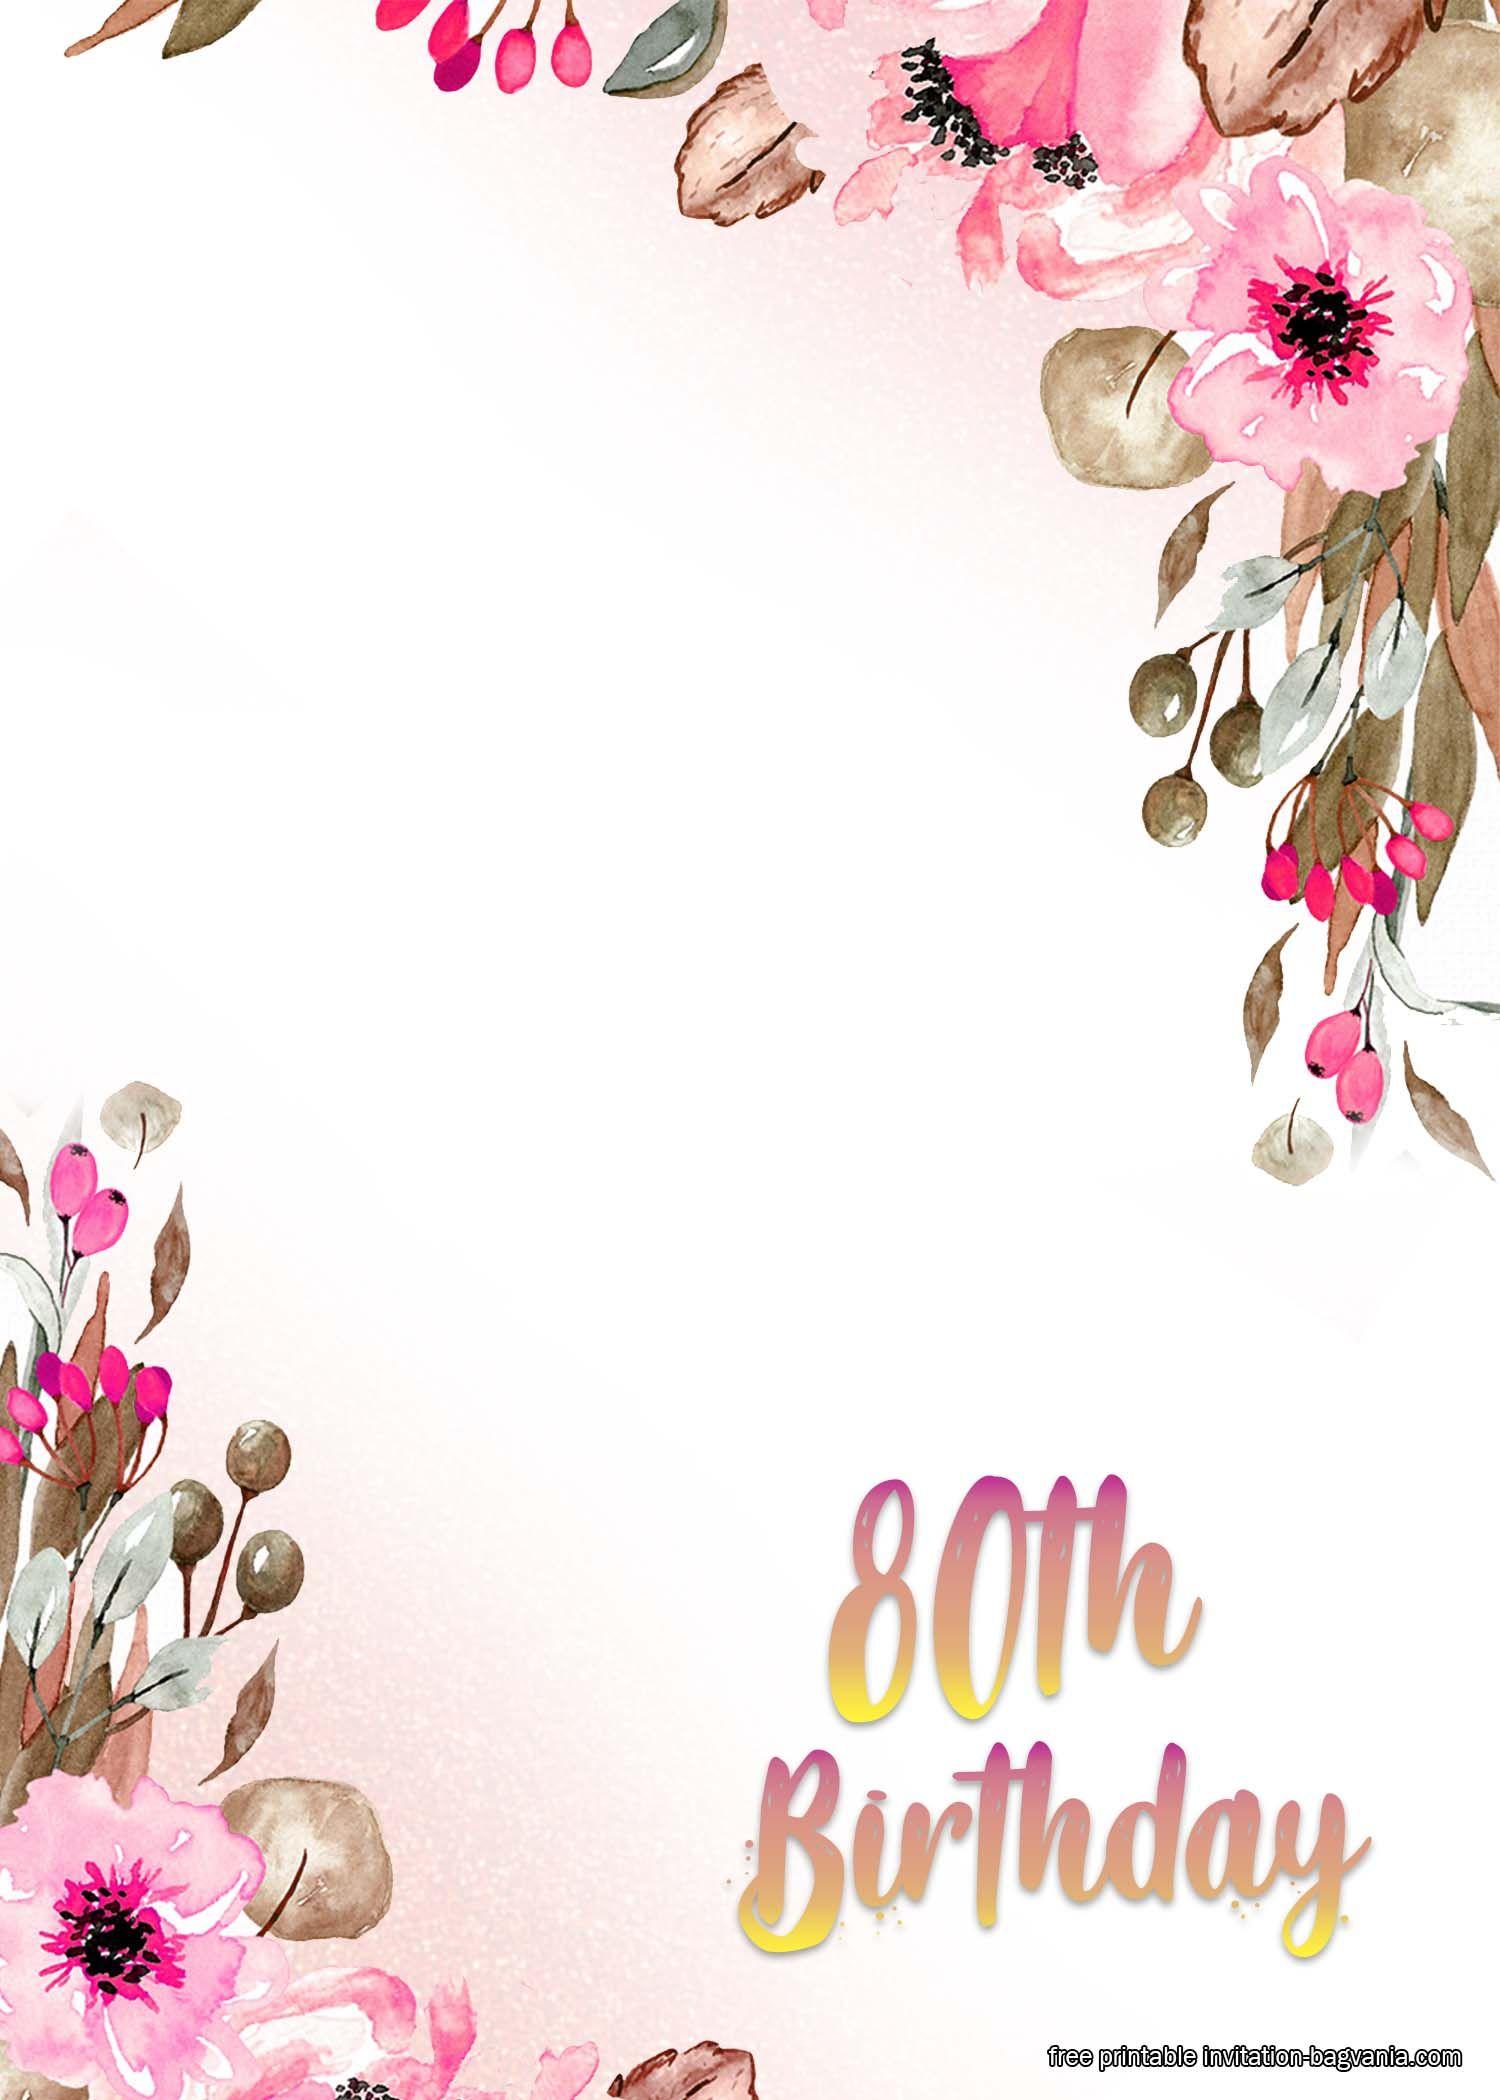 Free Printable 80th Birthday Invitation Templates 80th Birthday Invitations Birthday Invitation Templates Free Birthday Invitation Templates